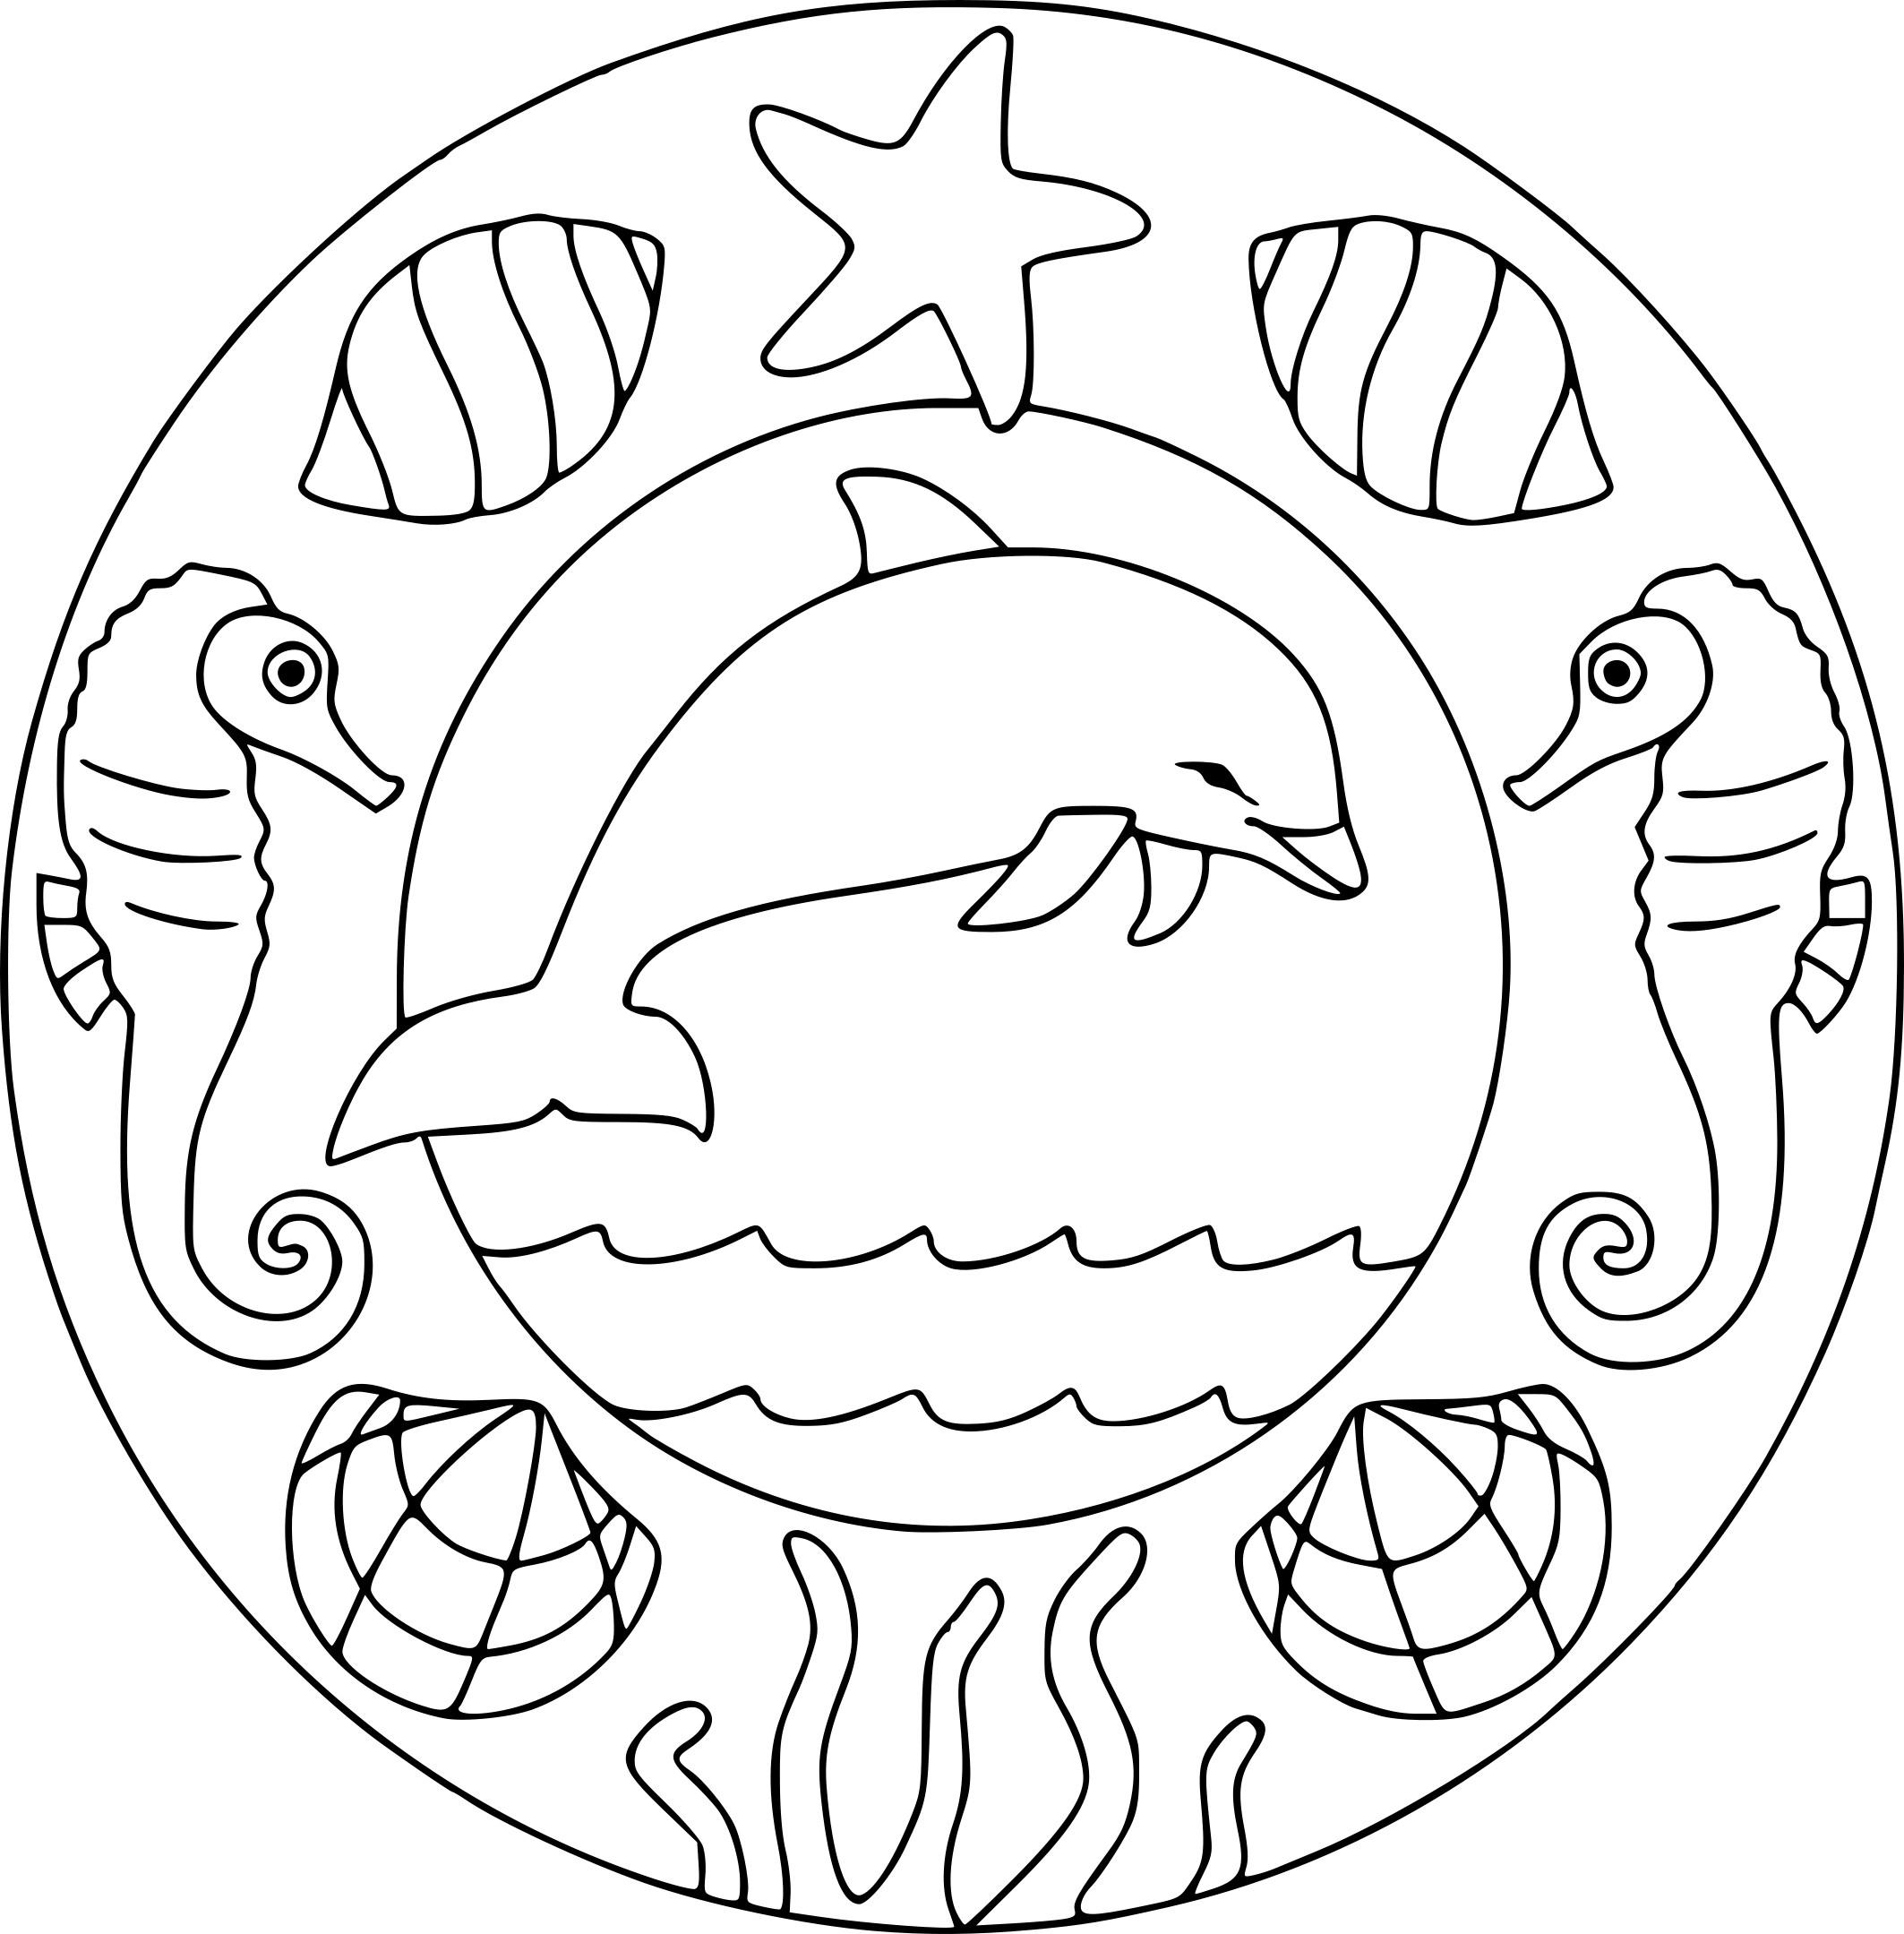 Coloriage Dauphin Mandala Dessin À Imprimer Sur Coloriages tout Coloriage A Imprimer De Dauphin